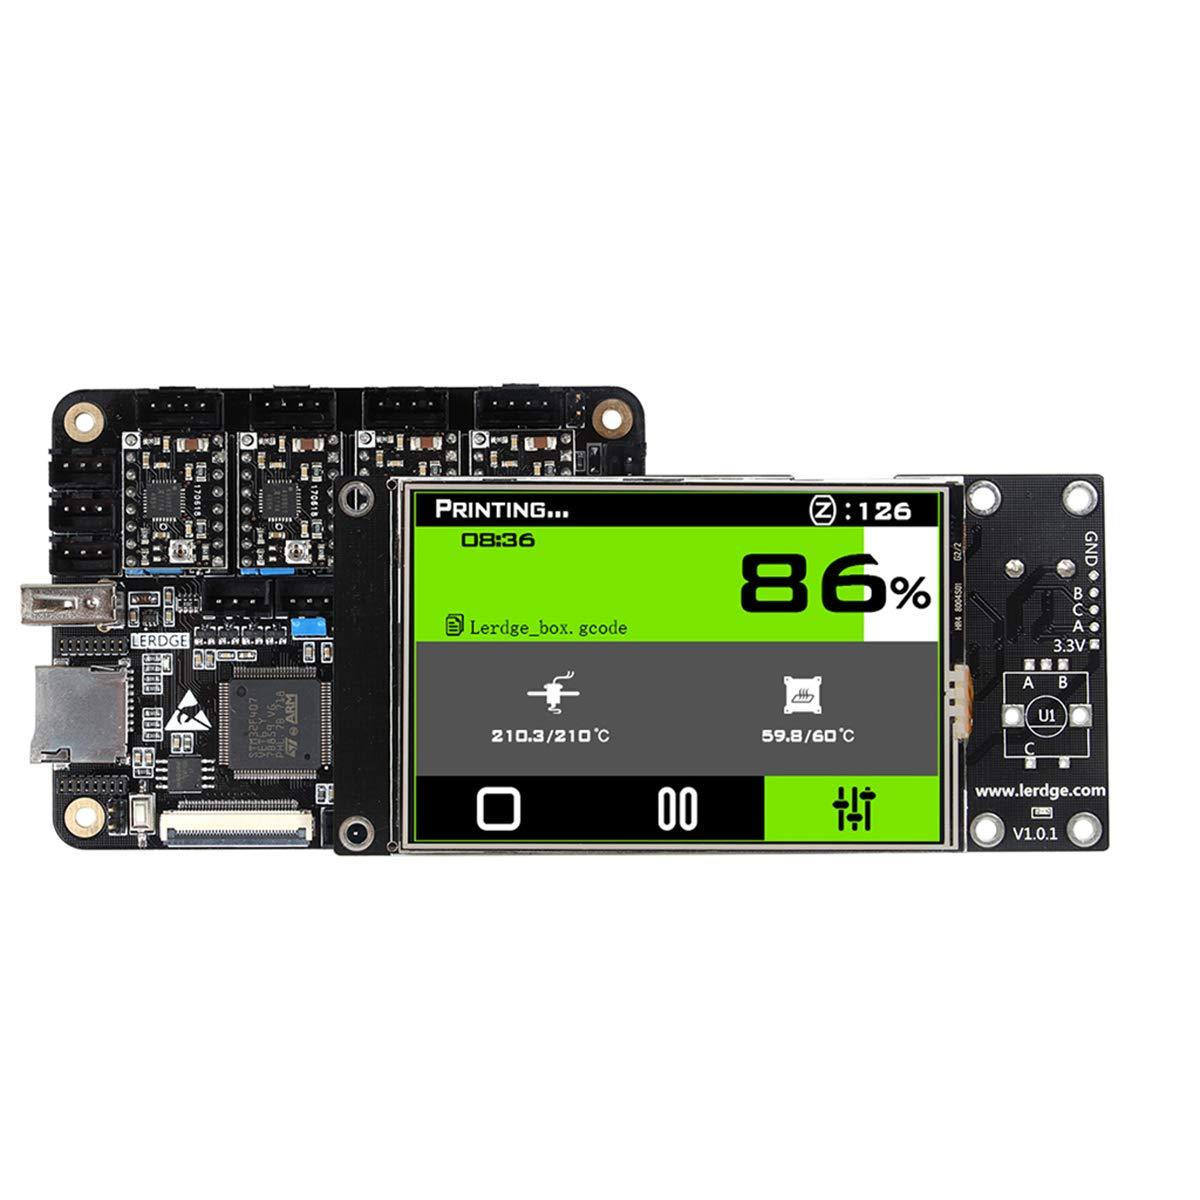 UKCOCO Lerdge-X ARM 32-bit Control Board with 3.5 inch Screen and 4 PCS A4988 Stepper Motor Drives Set 3D Printer Parts (Black)